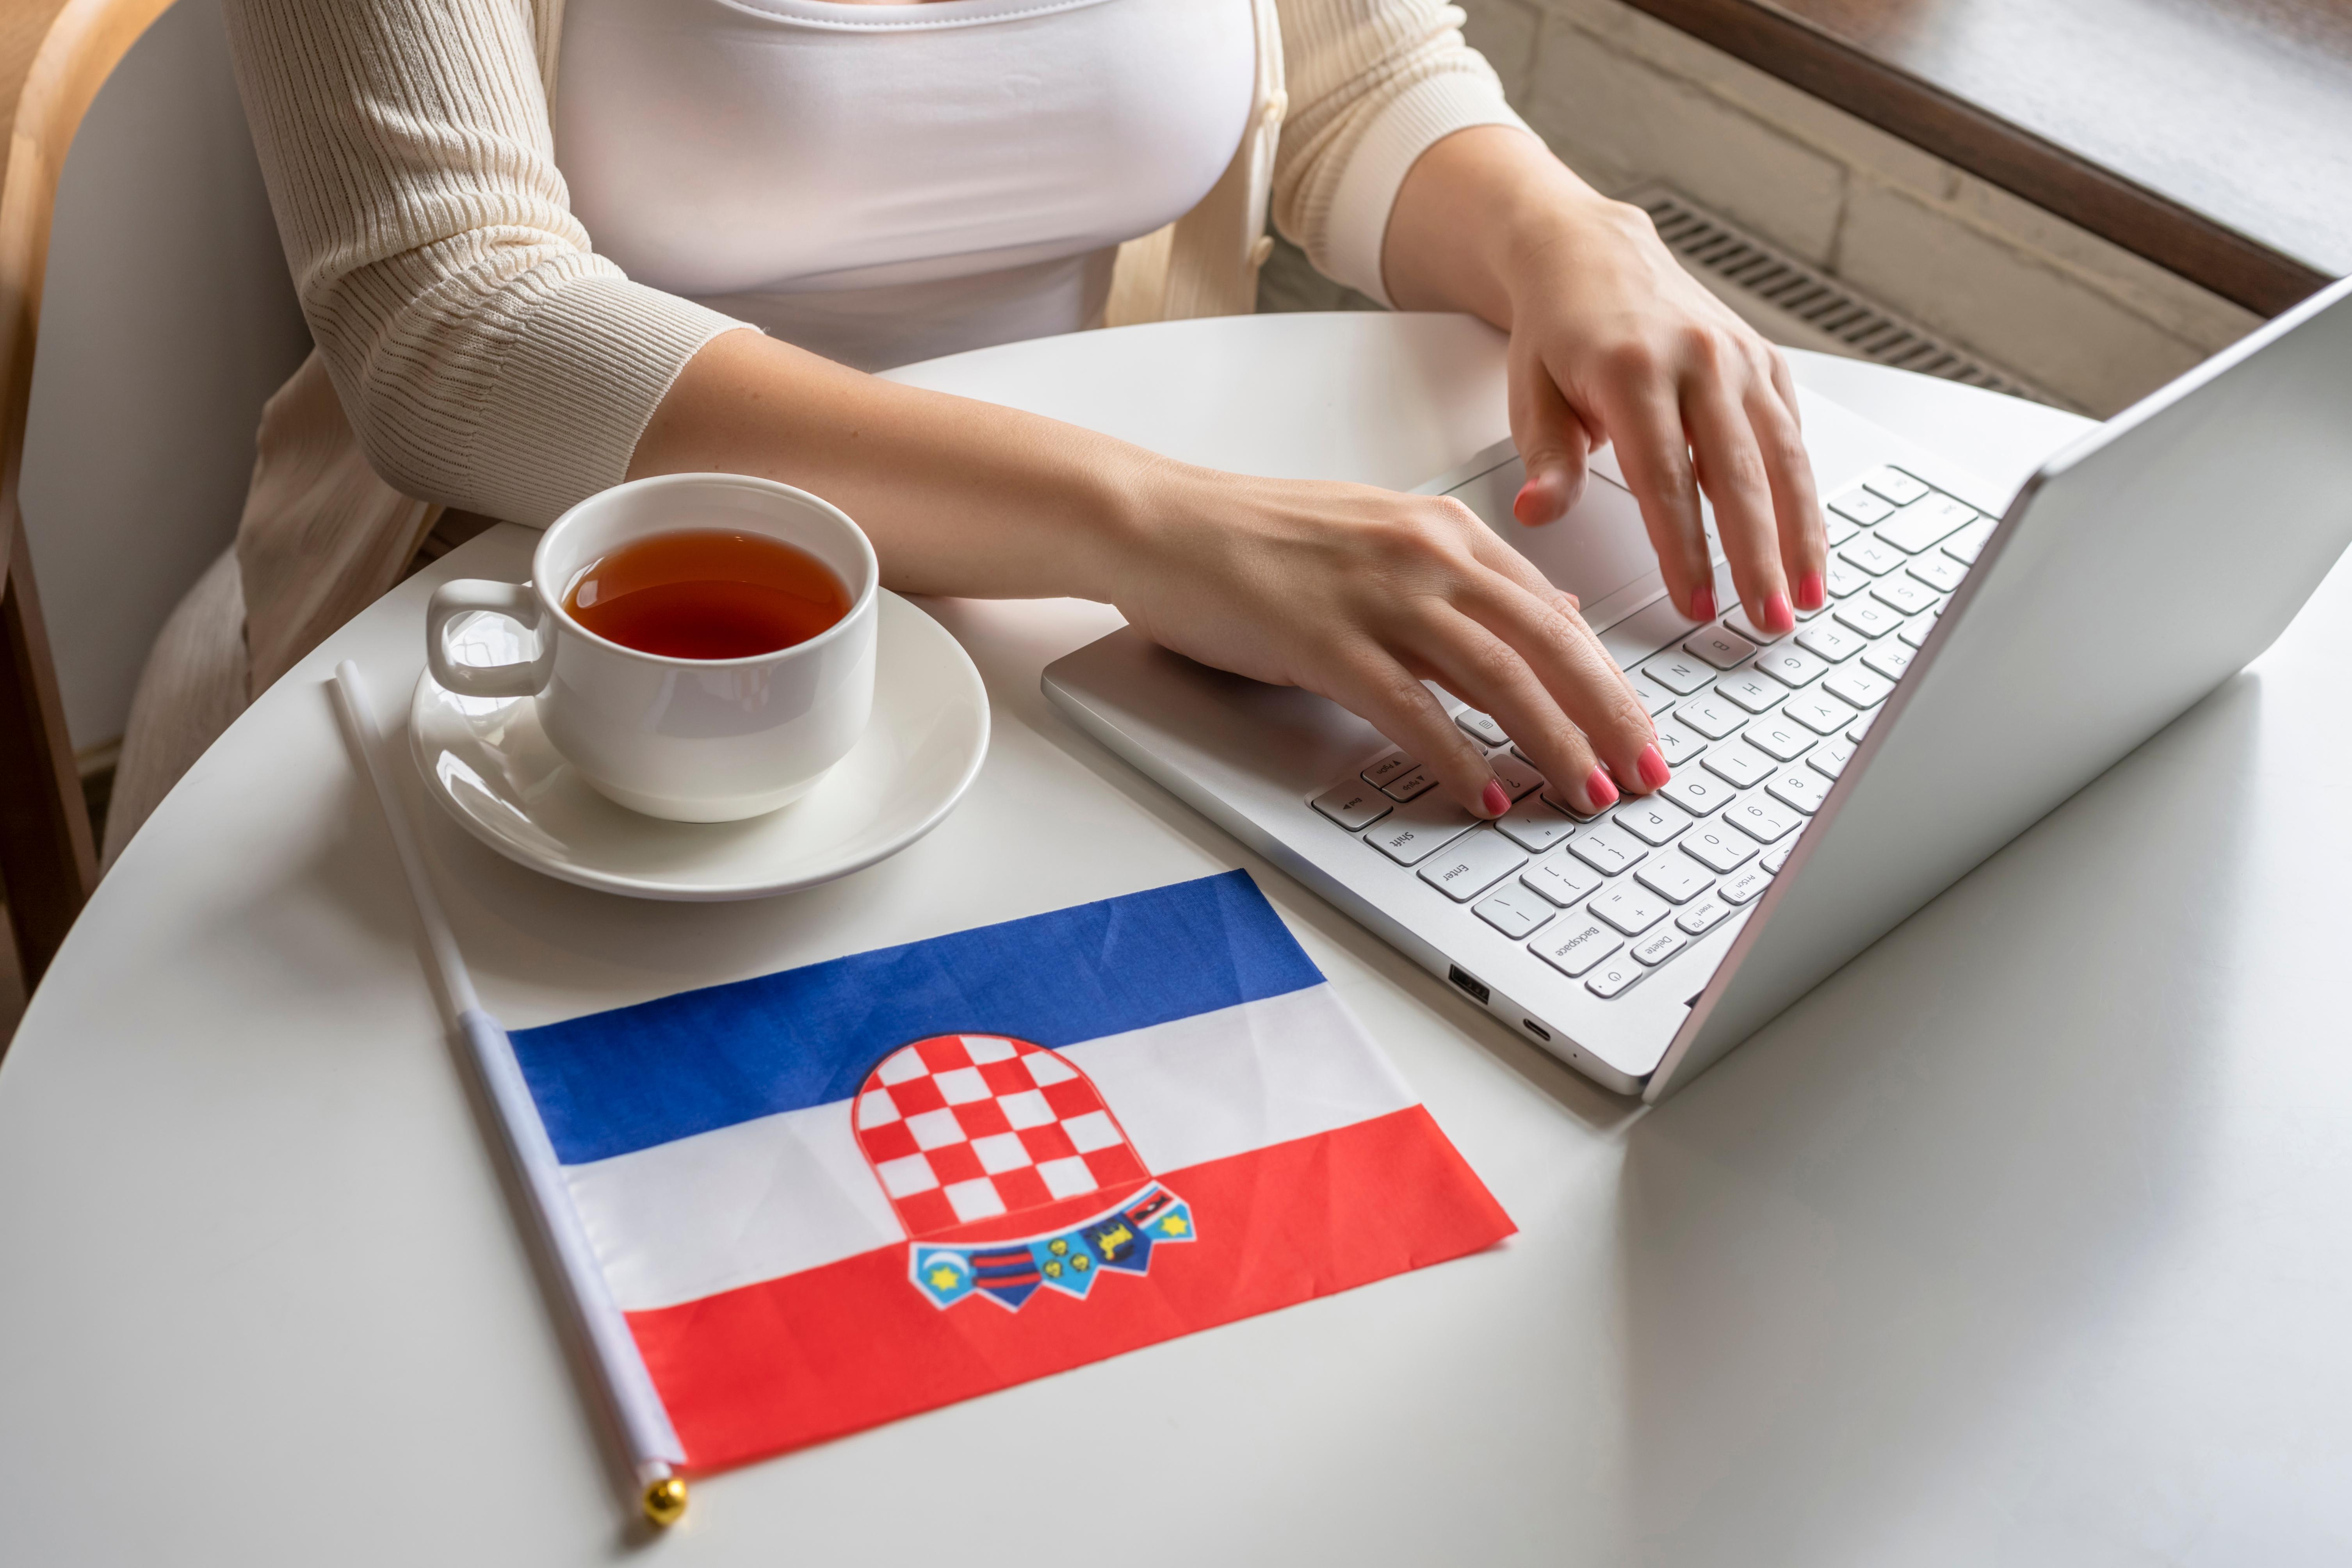 Девушка за ноутбуком возле флага Хорватии, где работа доступна для иностранцев